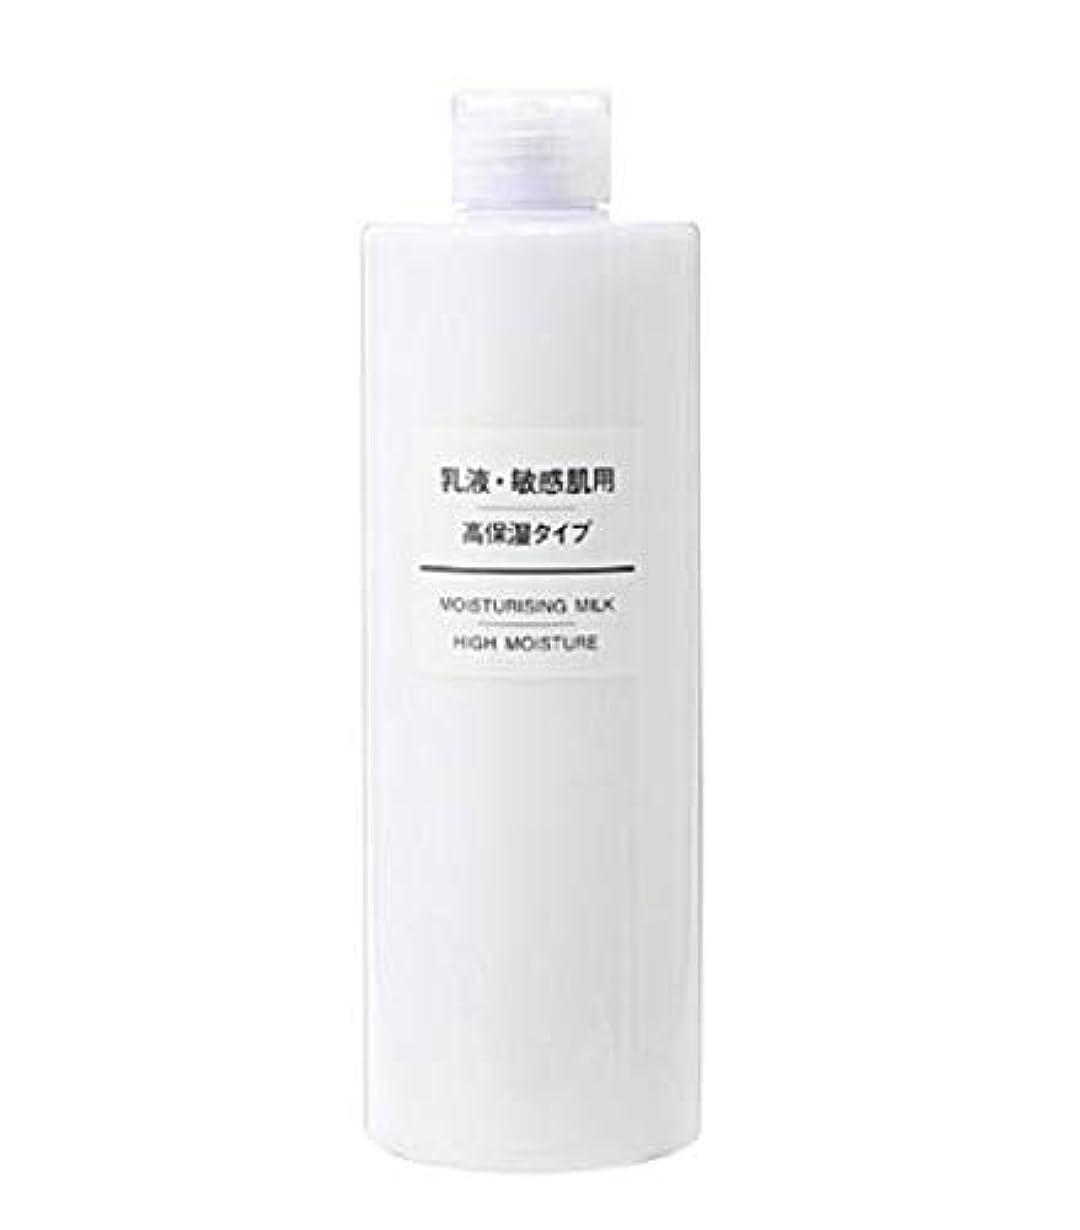 経済膨張する世代無印良品 乳液 敏感肌用 高保湿タイプ (大容量) 400ml